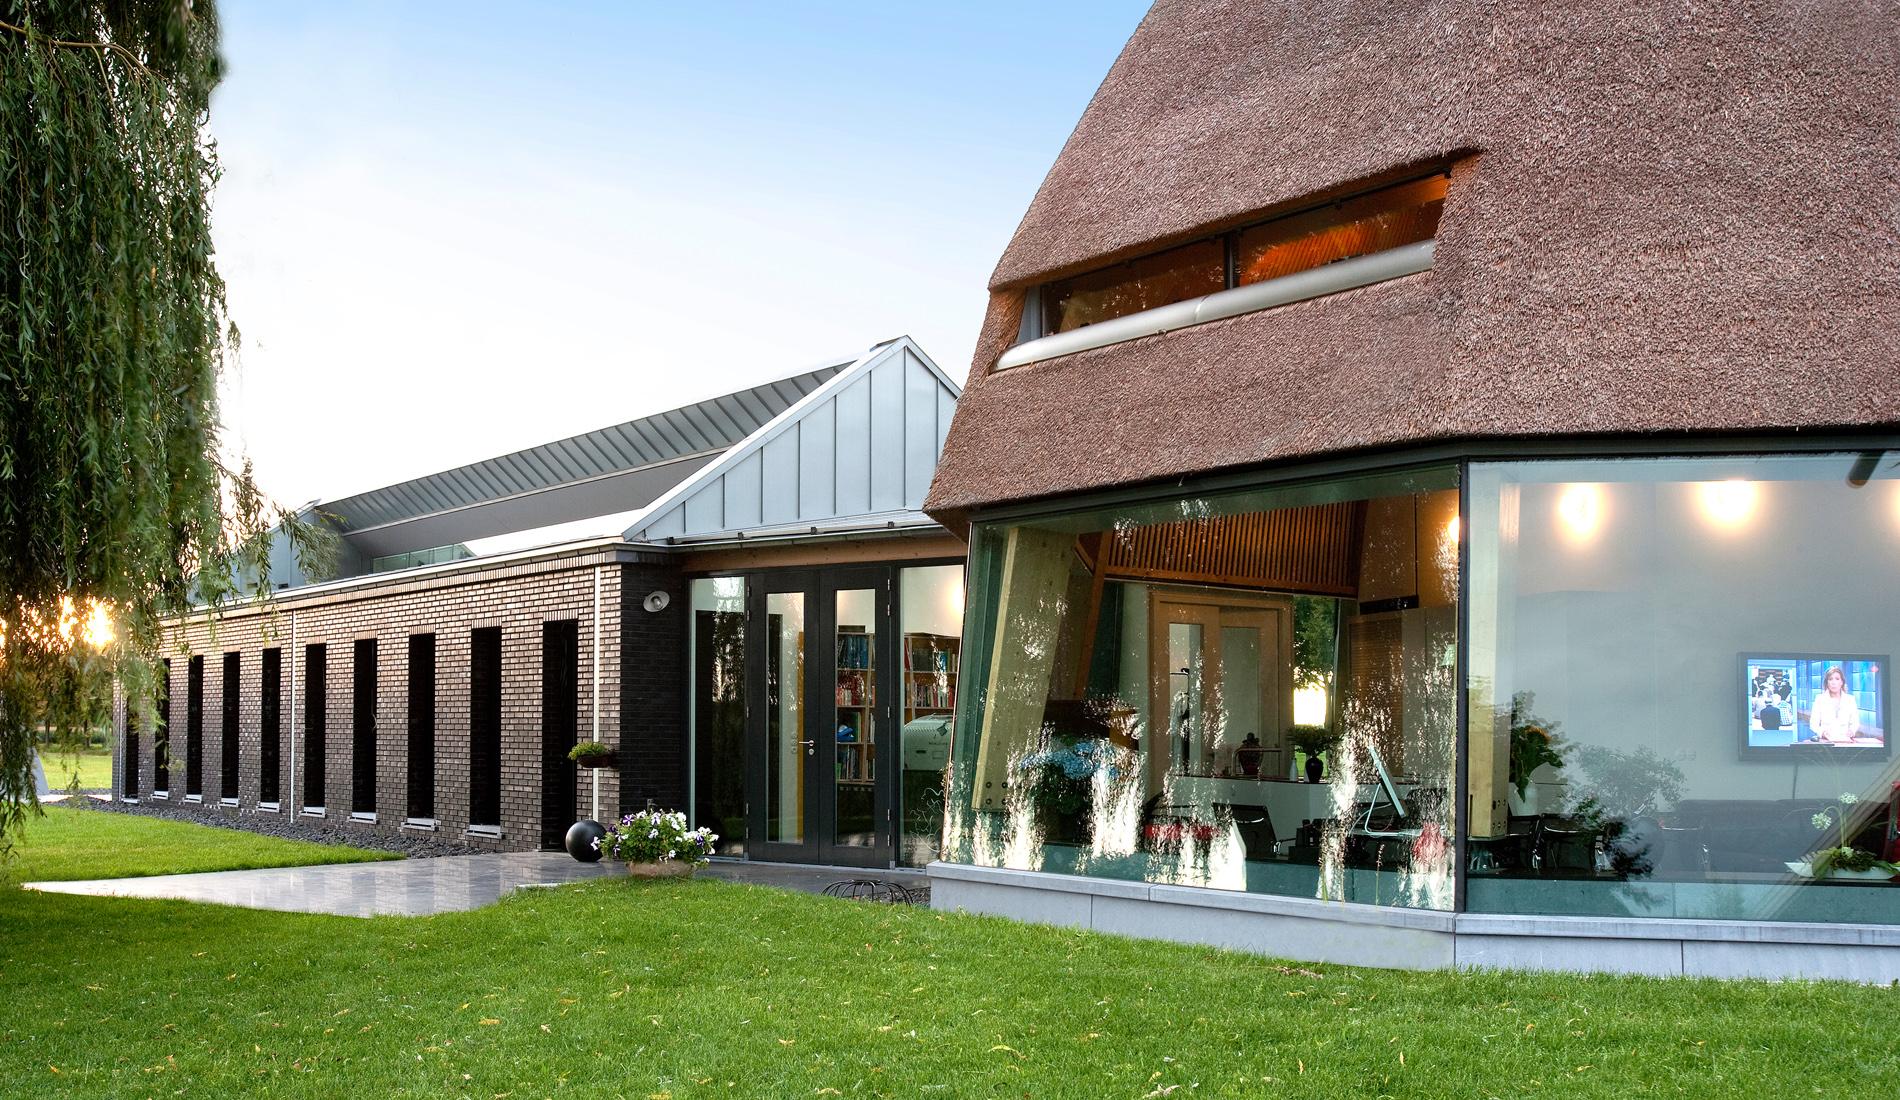 giesen bouwen schuur keijenborg Doetinchem Achterhoek houtskelet hout constructie ecologische architect architectuur groen landelijk riet modern strak design rieten kap biobased duurzaam biologisch